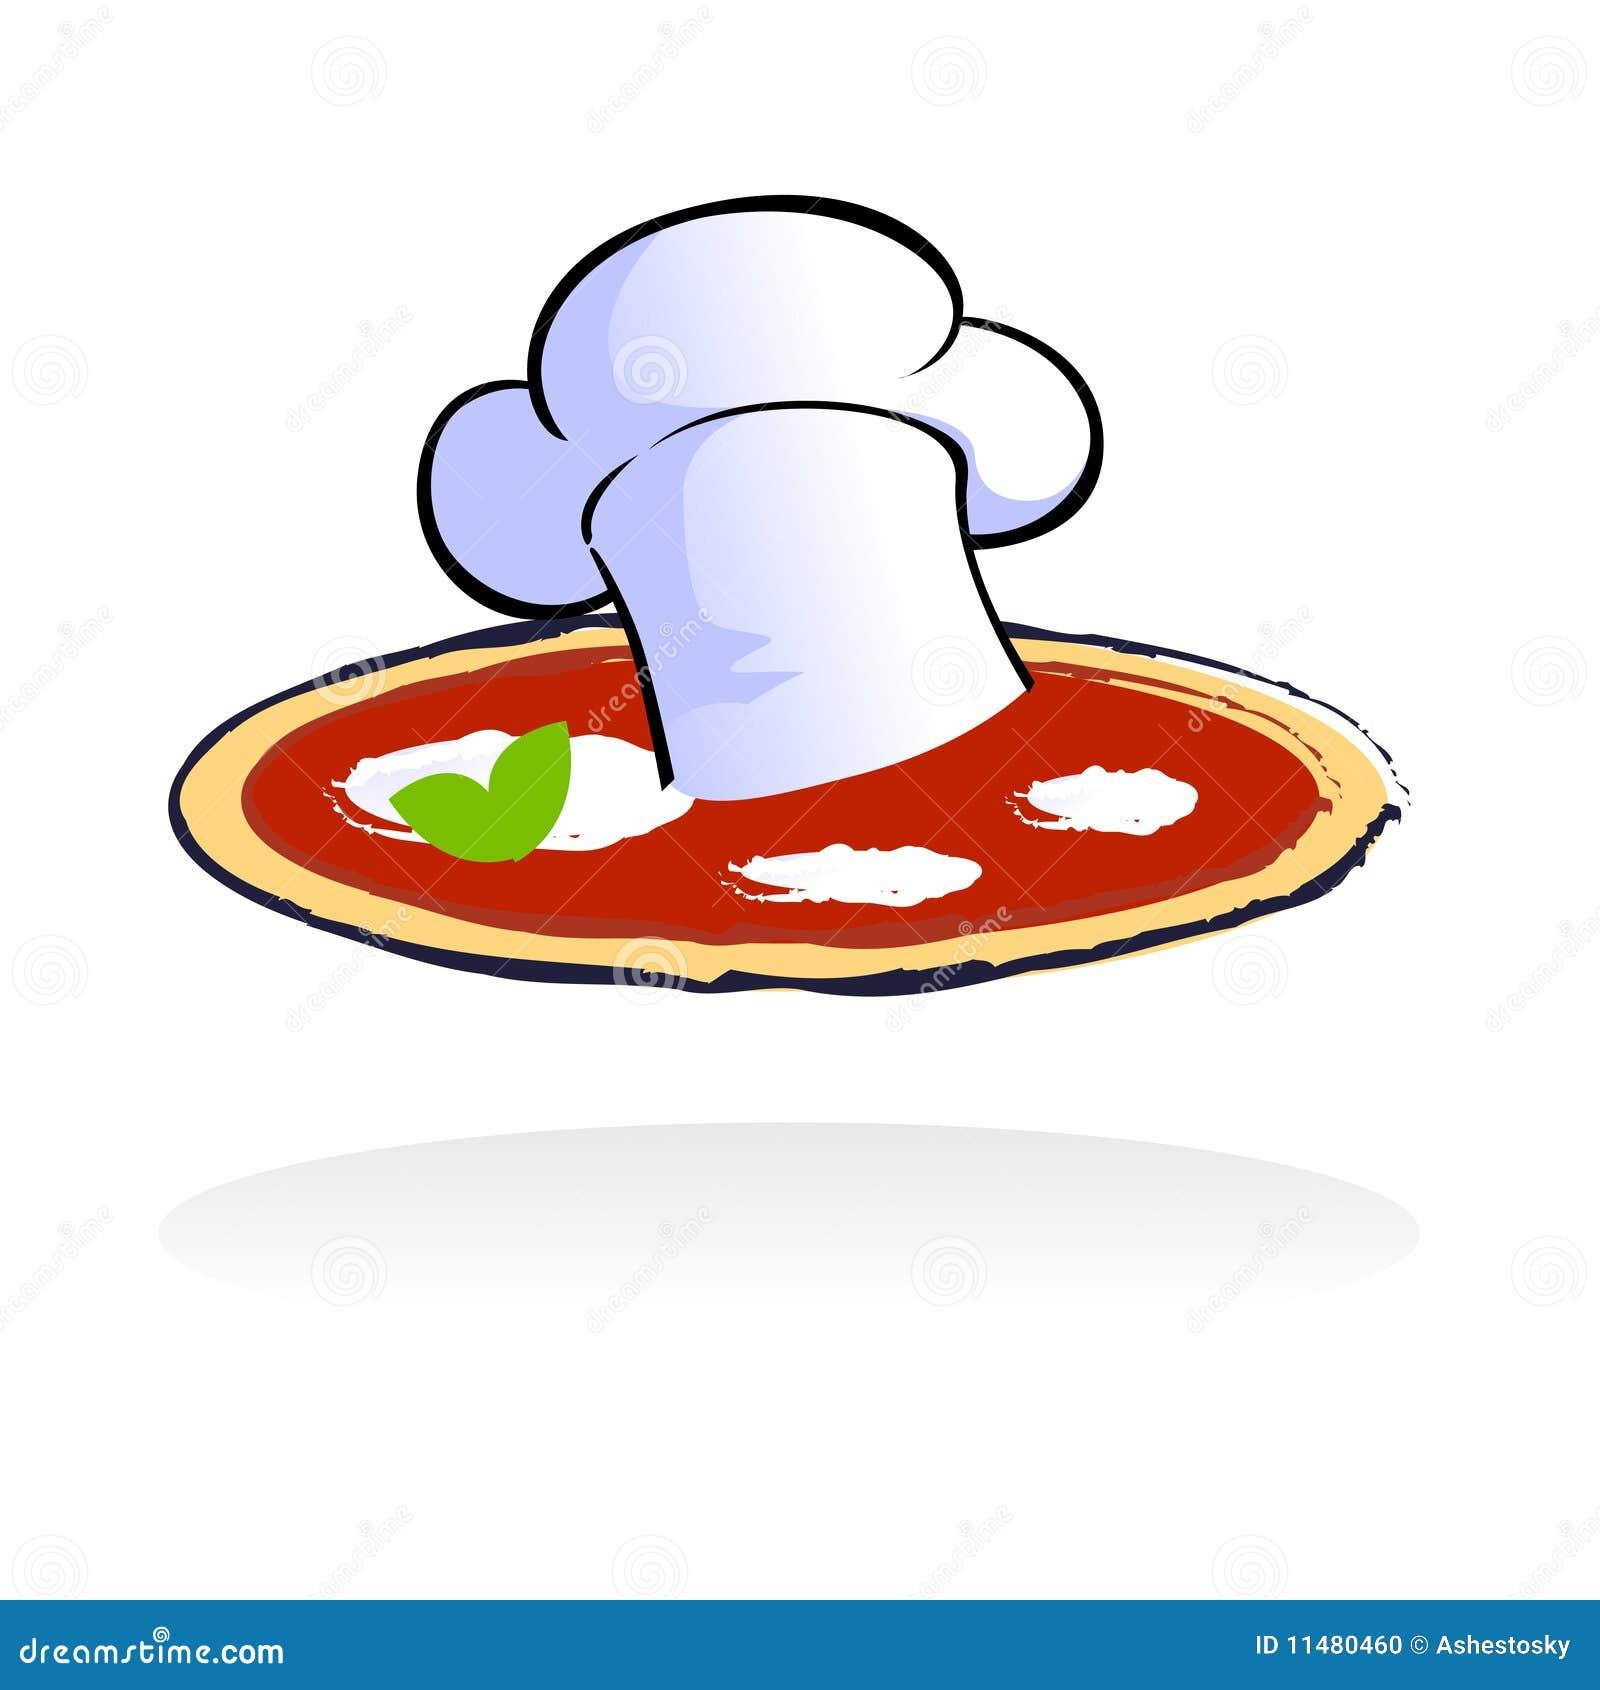 Foto de Stock: Logotipo do restaurante da pizza